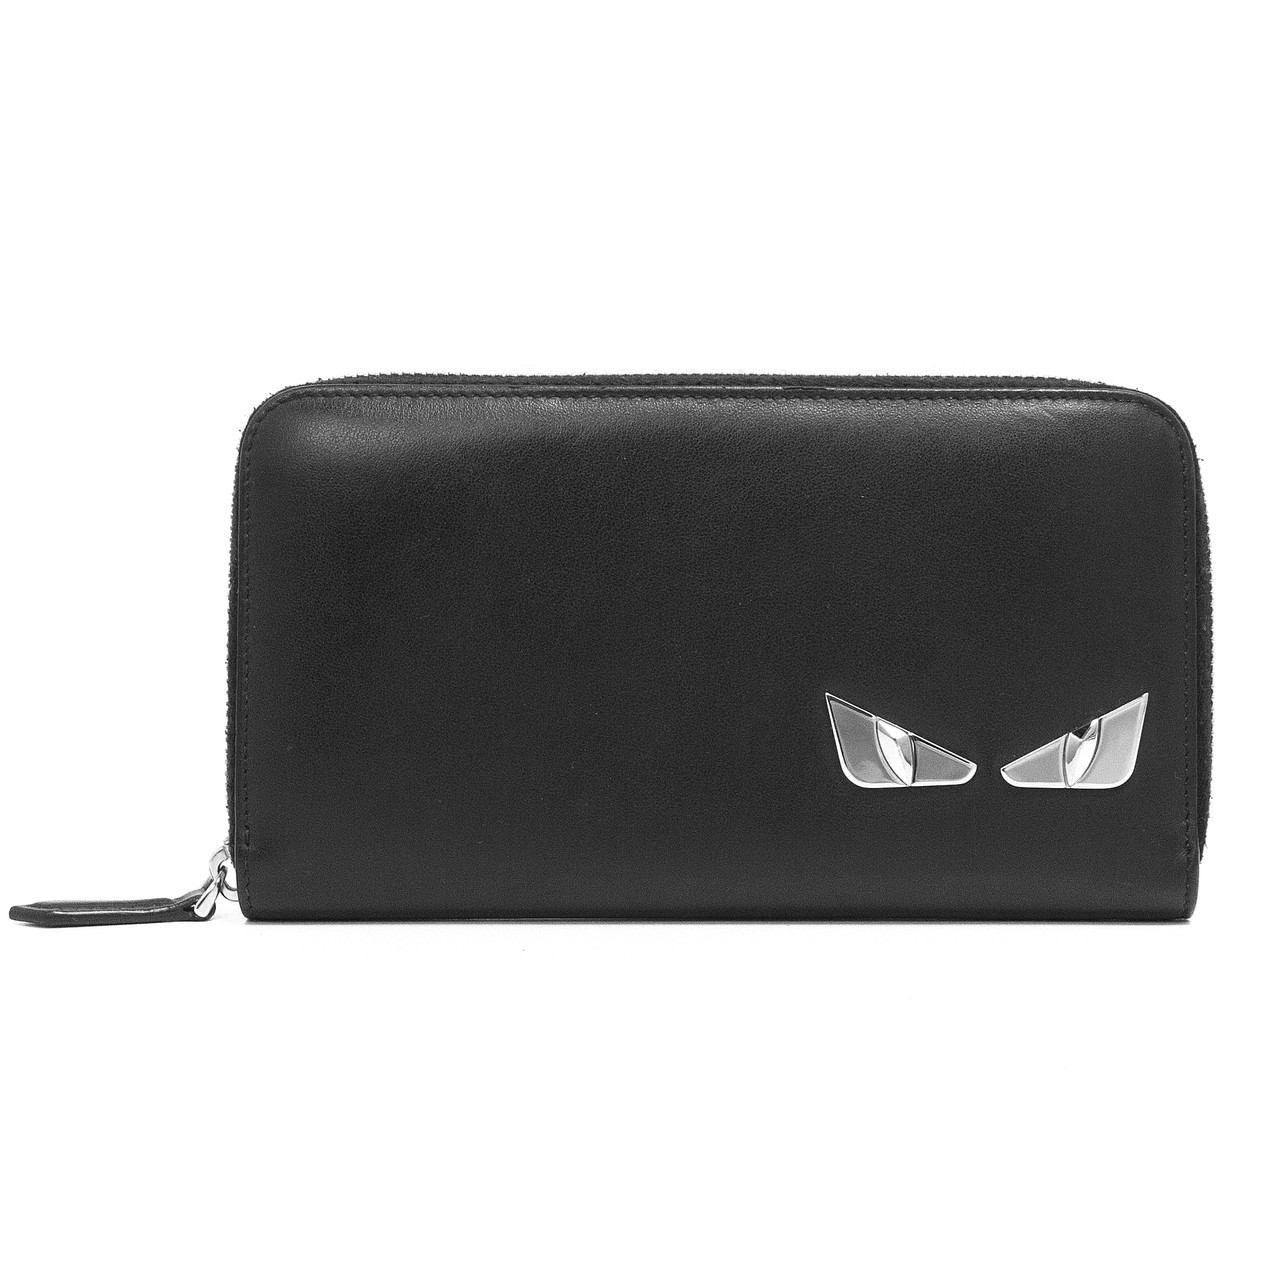 08b14661 Fendi Black Calfskin Monster Eyes Zip Around Wallet